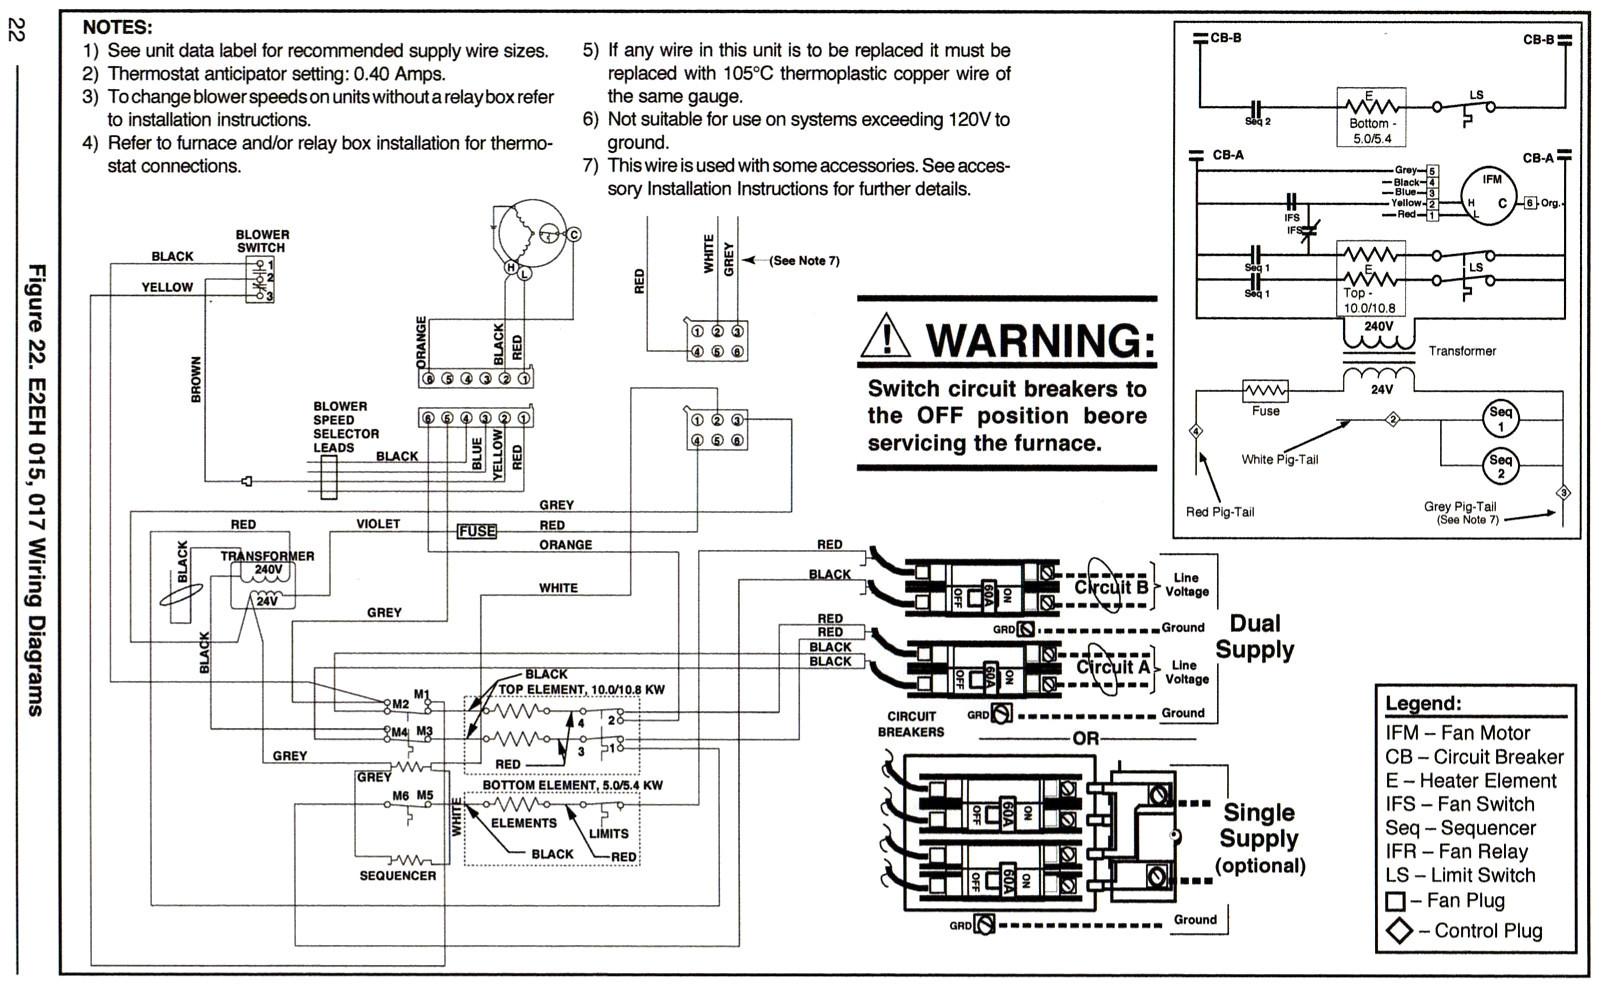 on a24 10 goodman wiring diagram